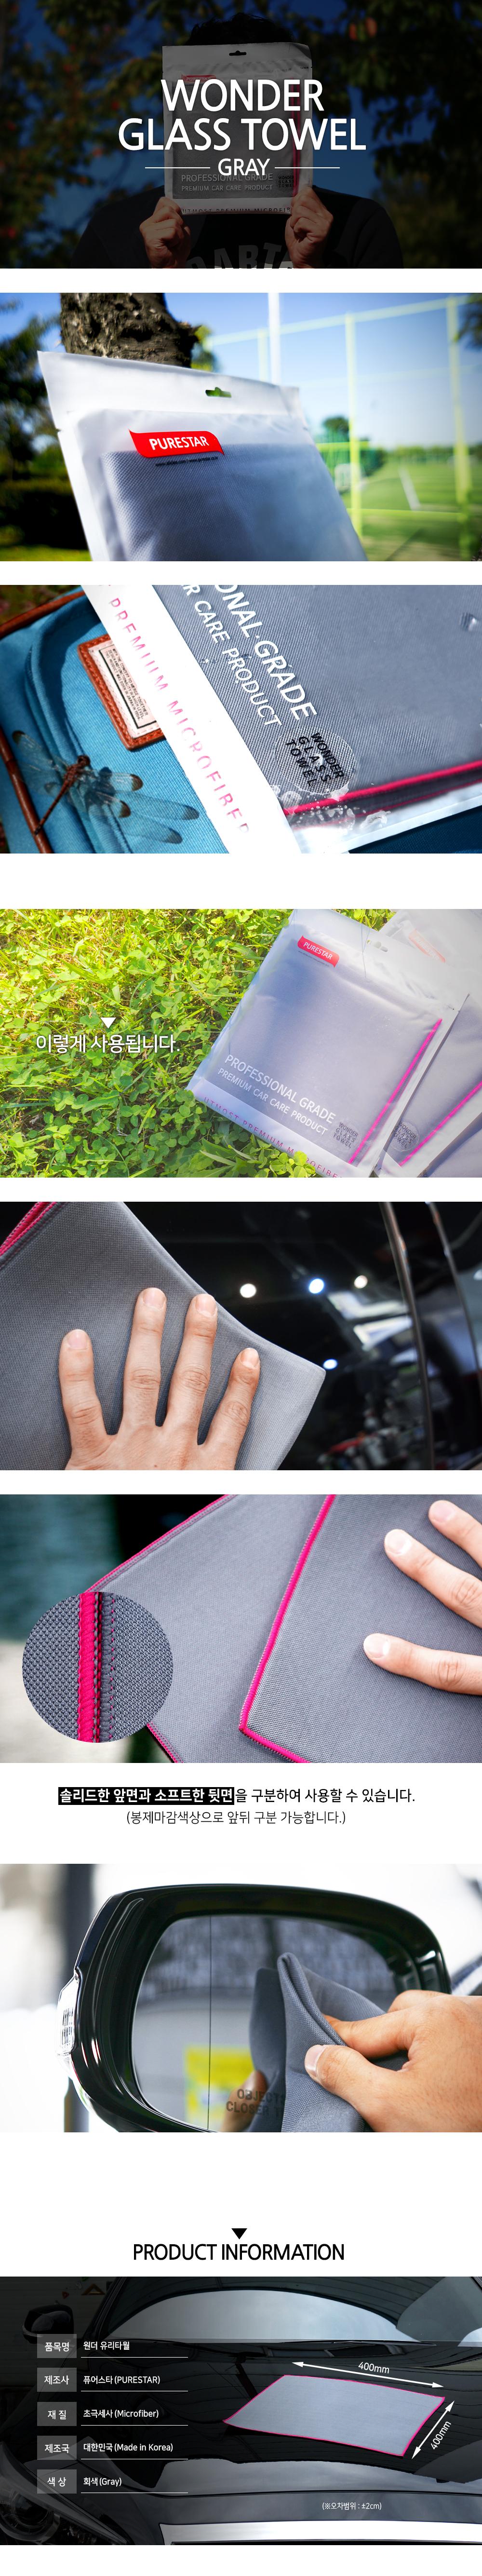 171020_PSG_wonder-glass-towel_gray.jpg